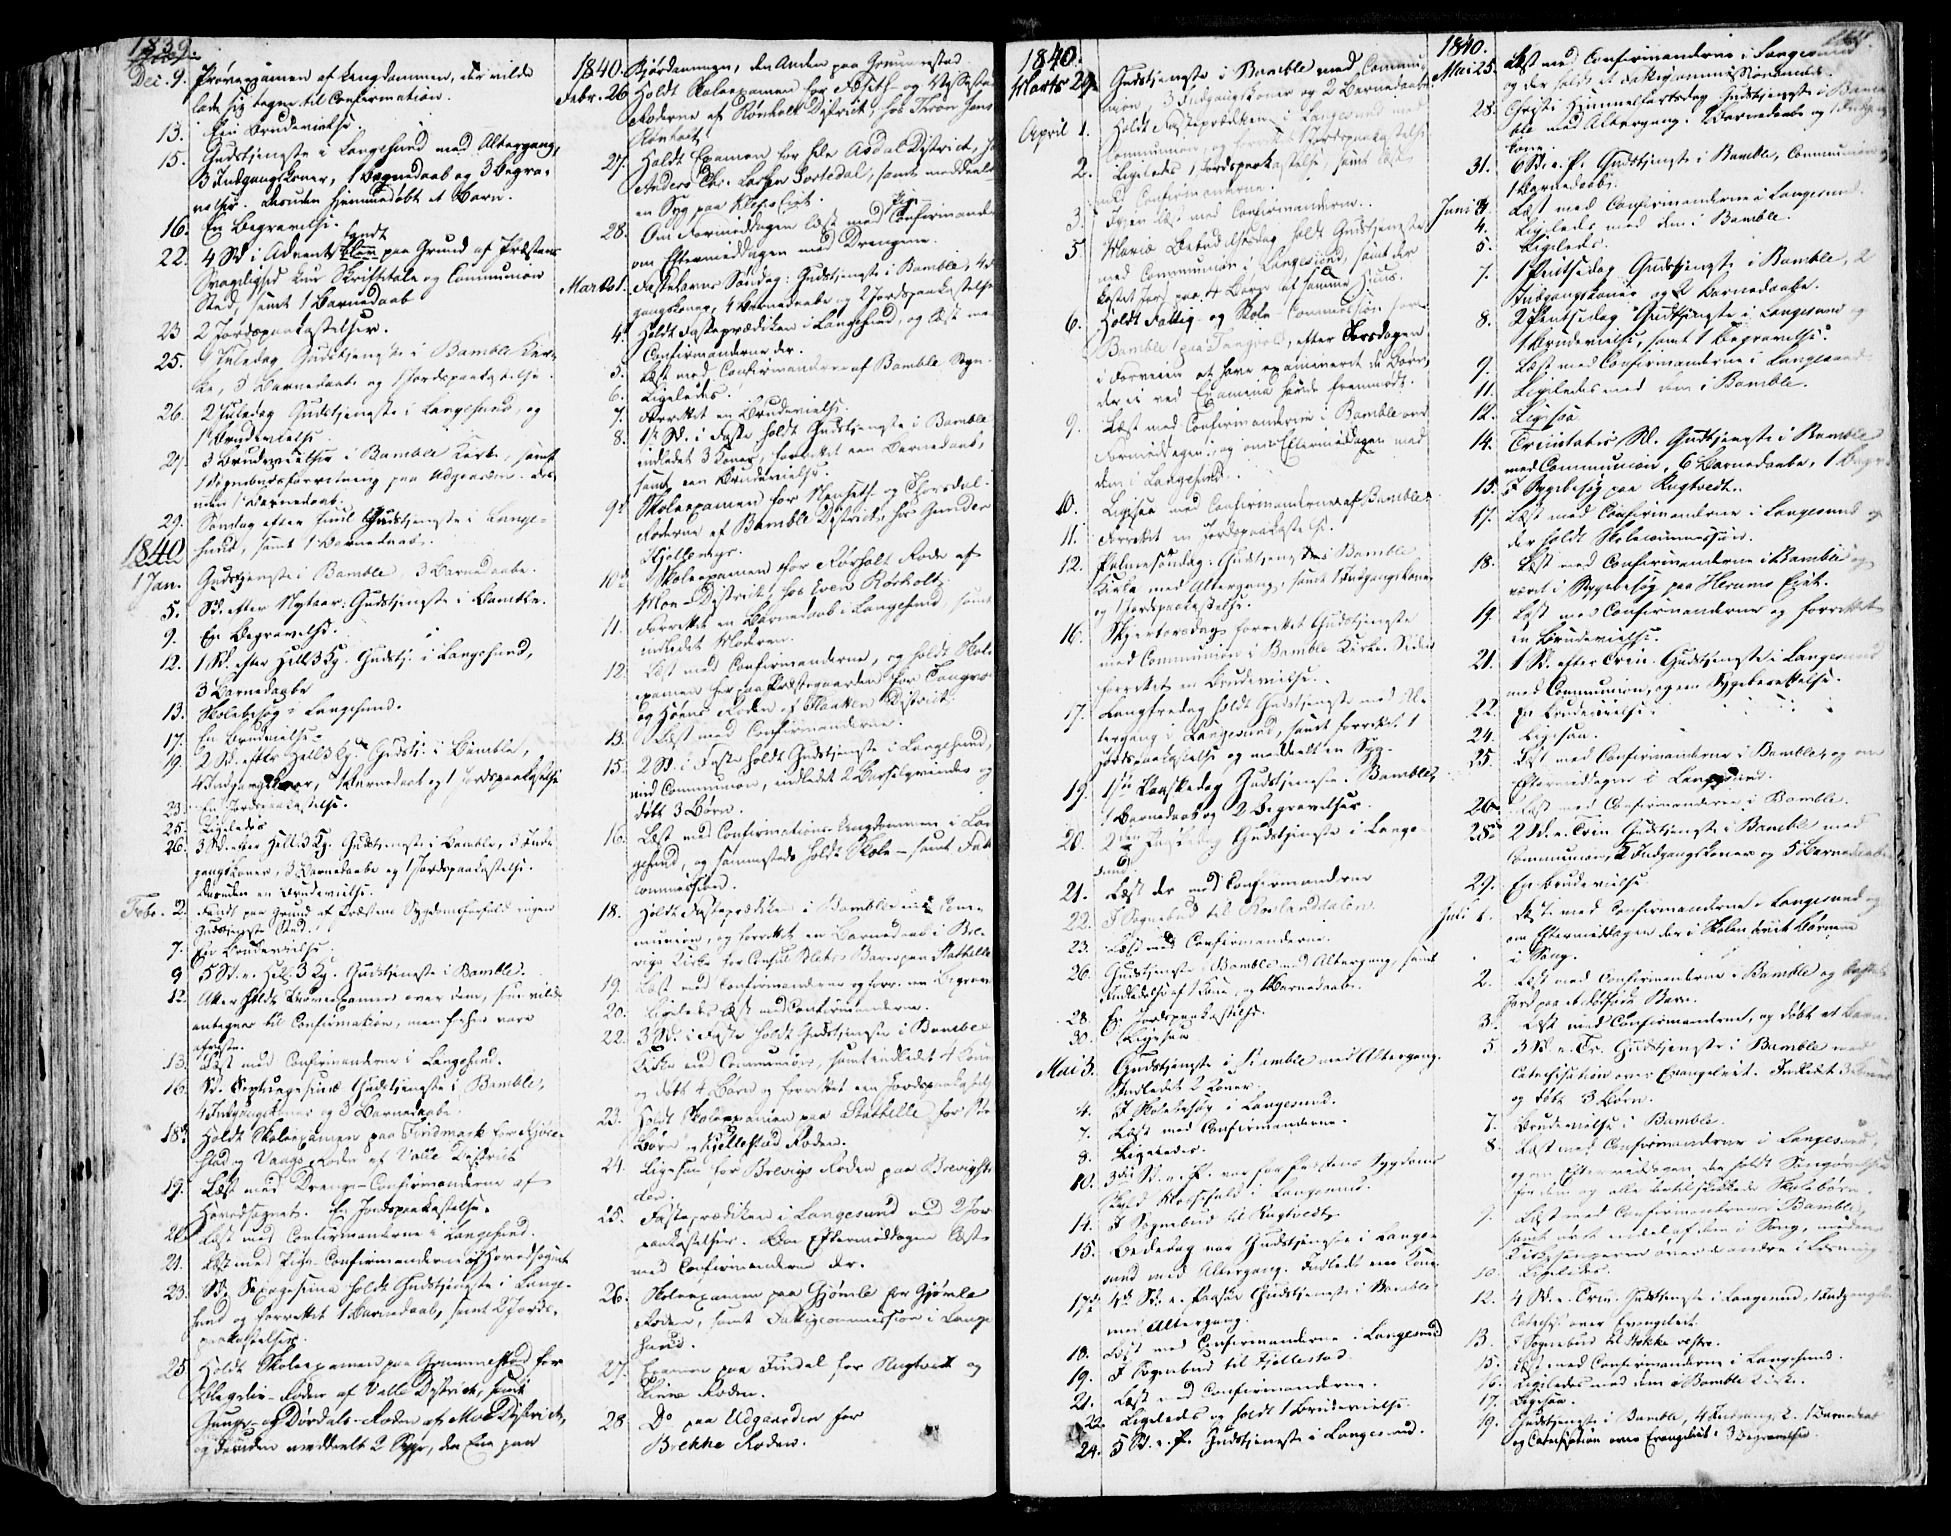 SAKO, Bamble kirkebøker, F/Fa/L0004: Ministerialbok nr. I 4, 1834-1853, s. 1110-1111